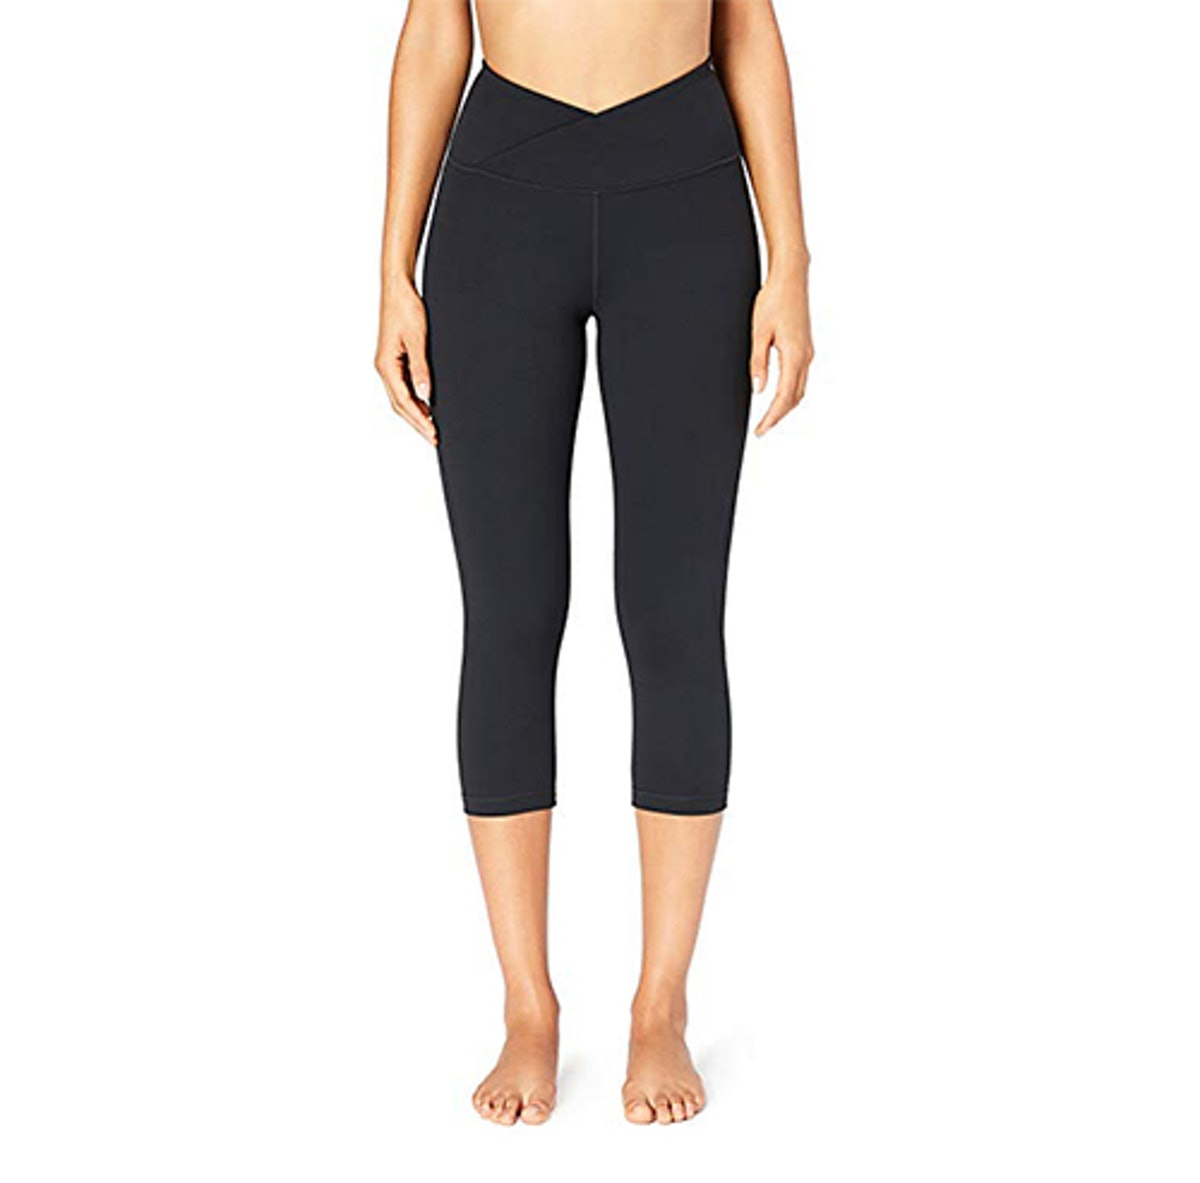 Core 10 Women's Build Your Own Leggings